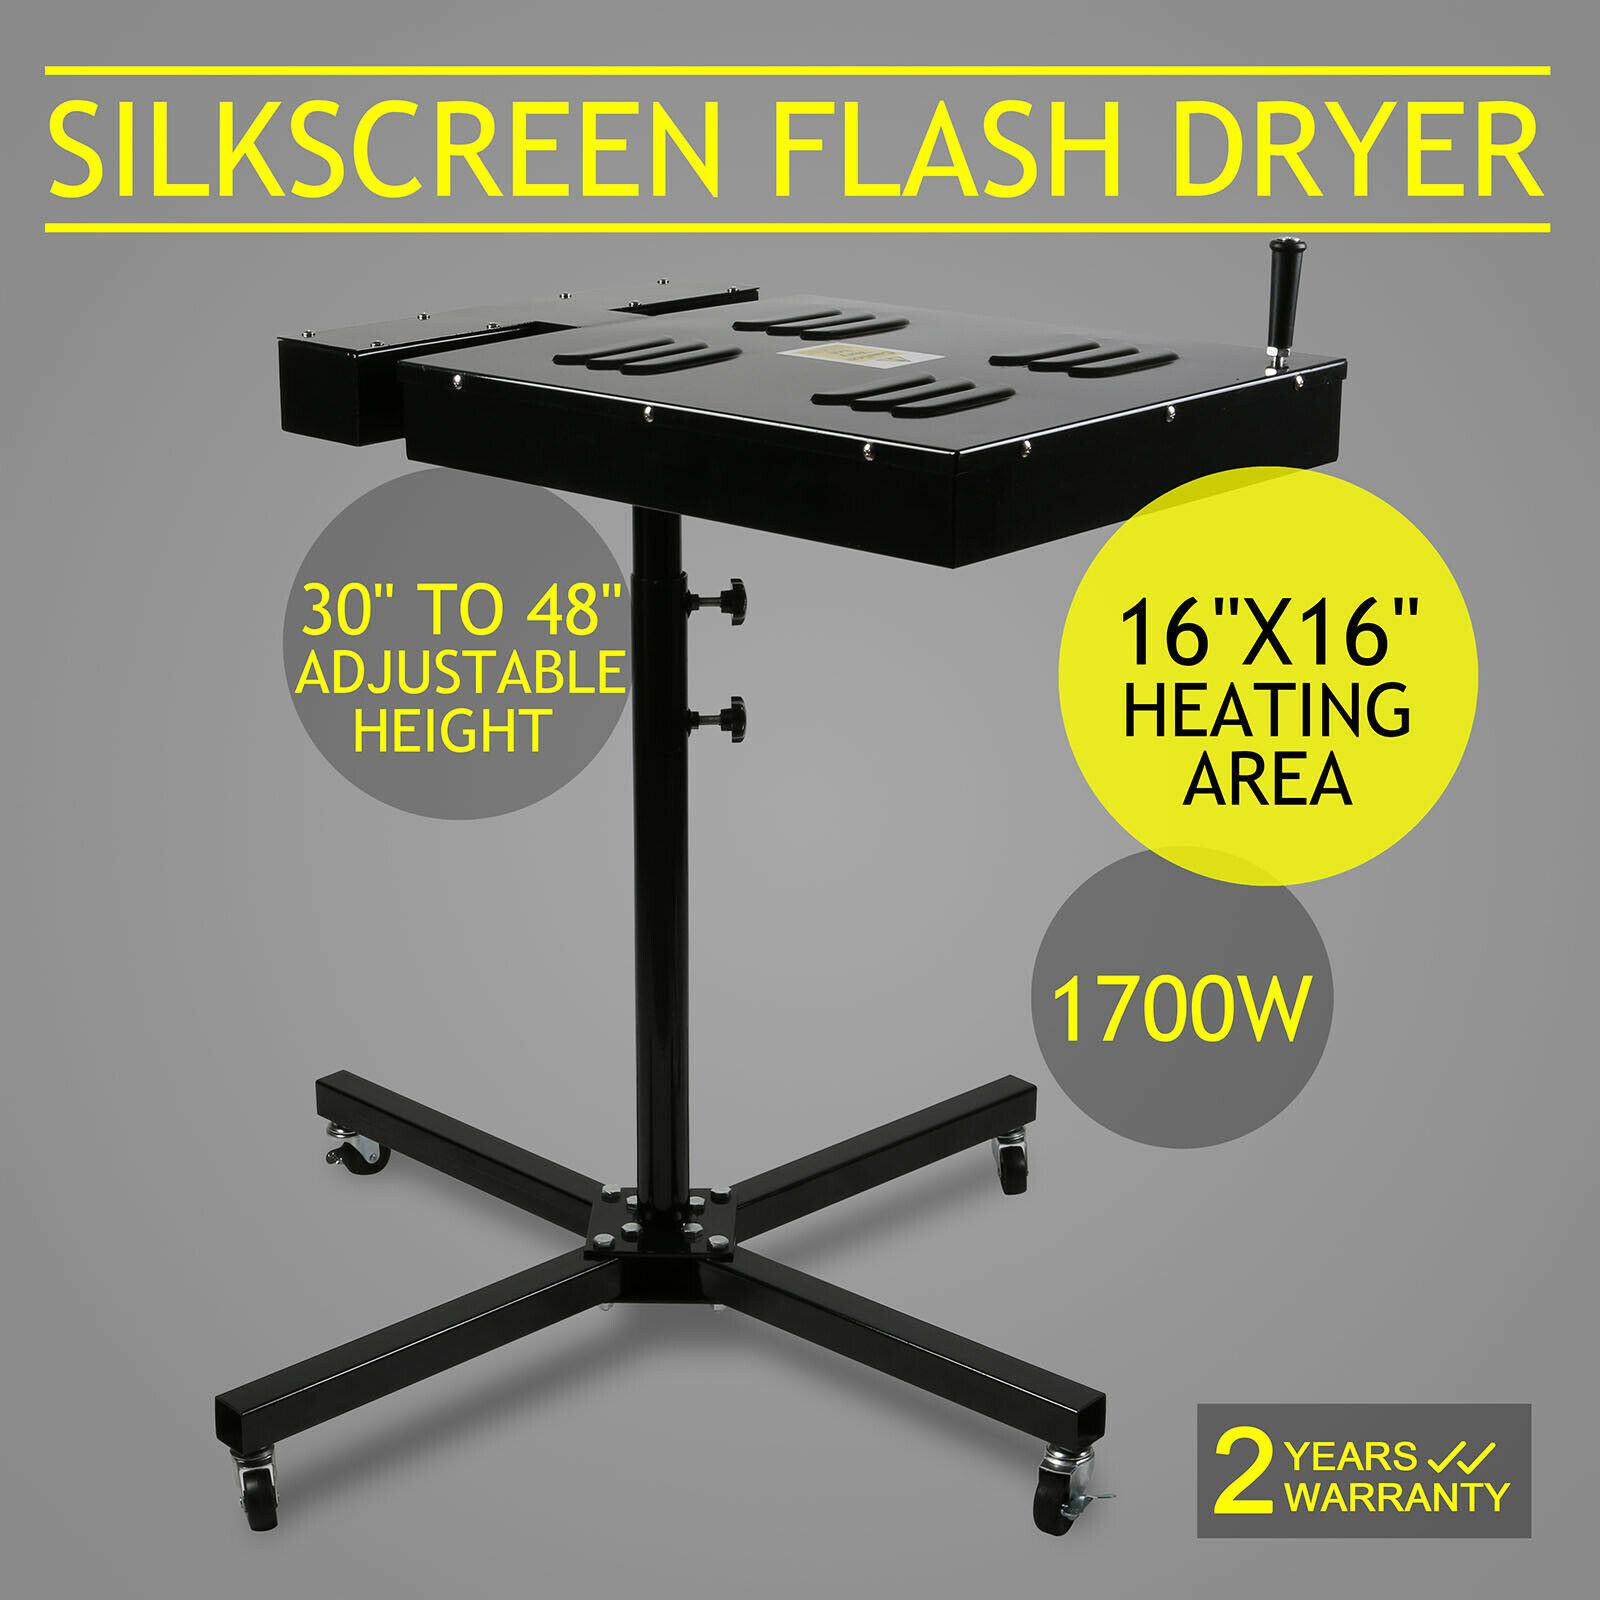 18x18 Flash Dryer Silkscreen Equipment T-shirt Printing Curing Adjustable Height